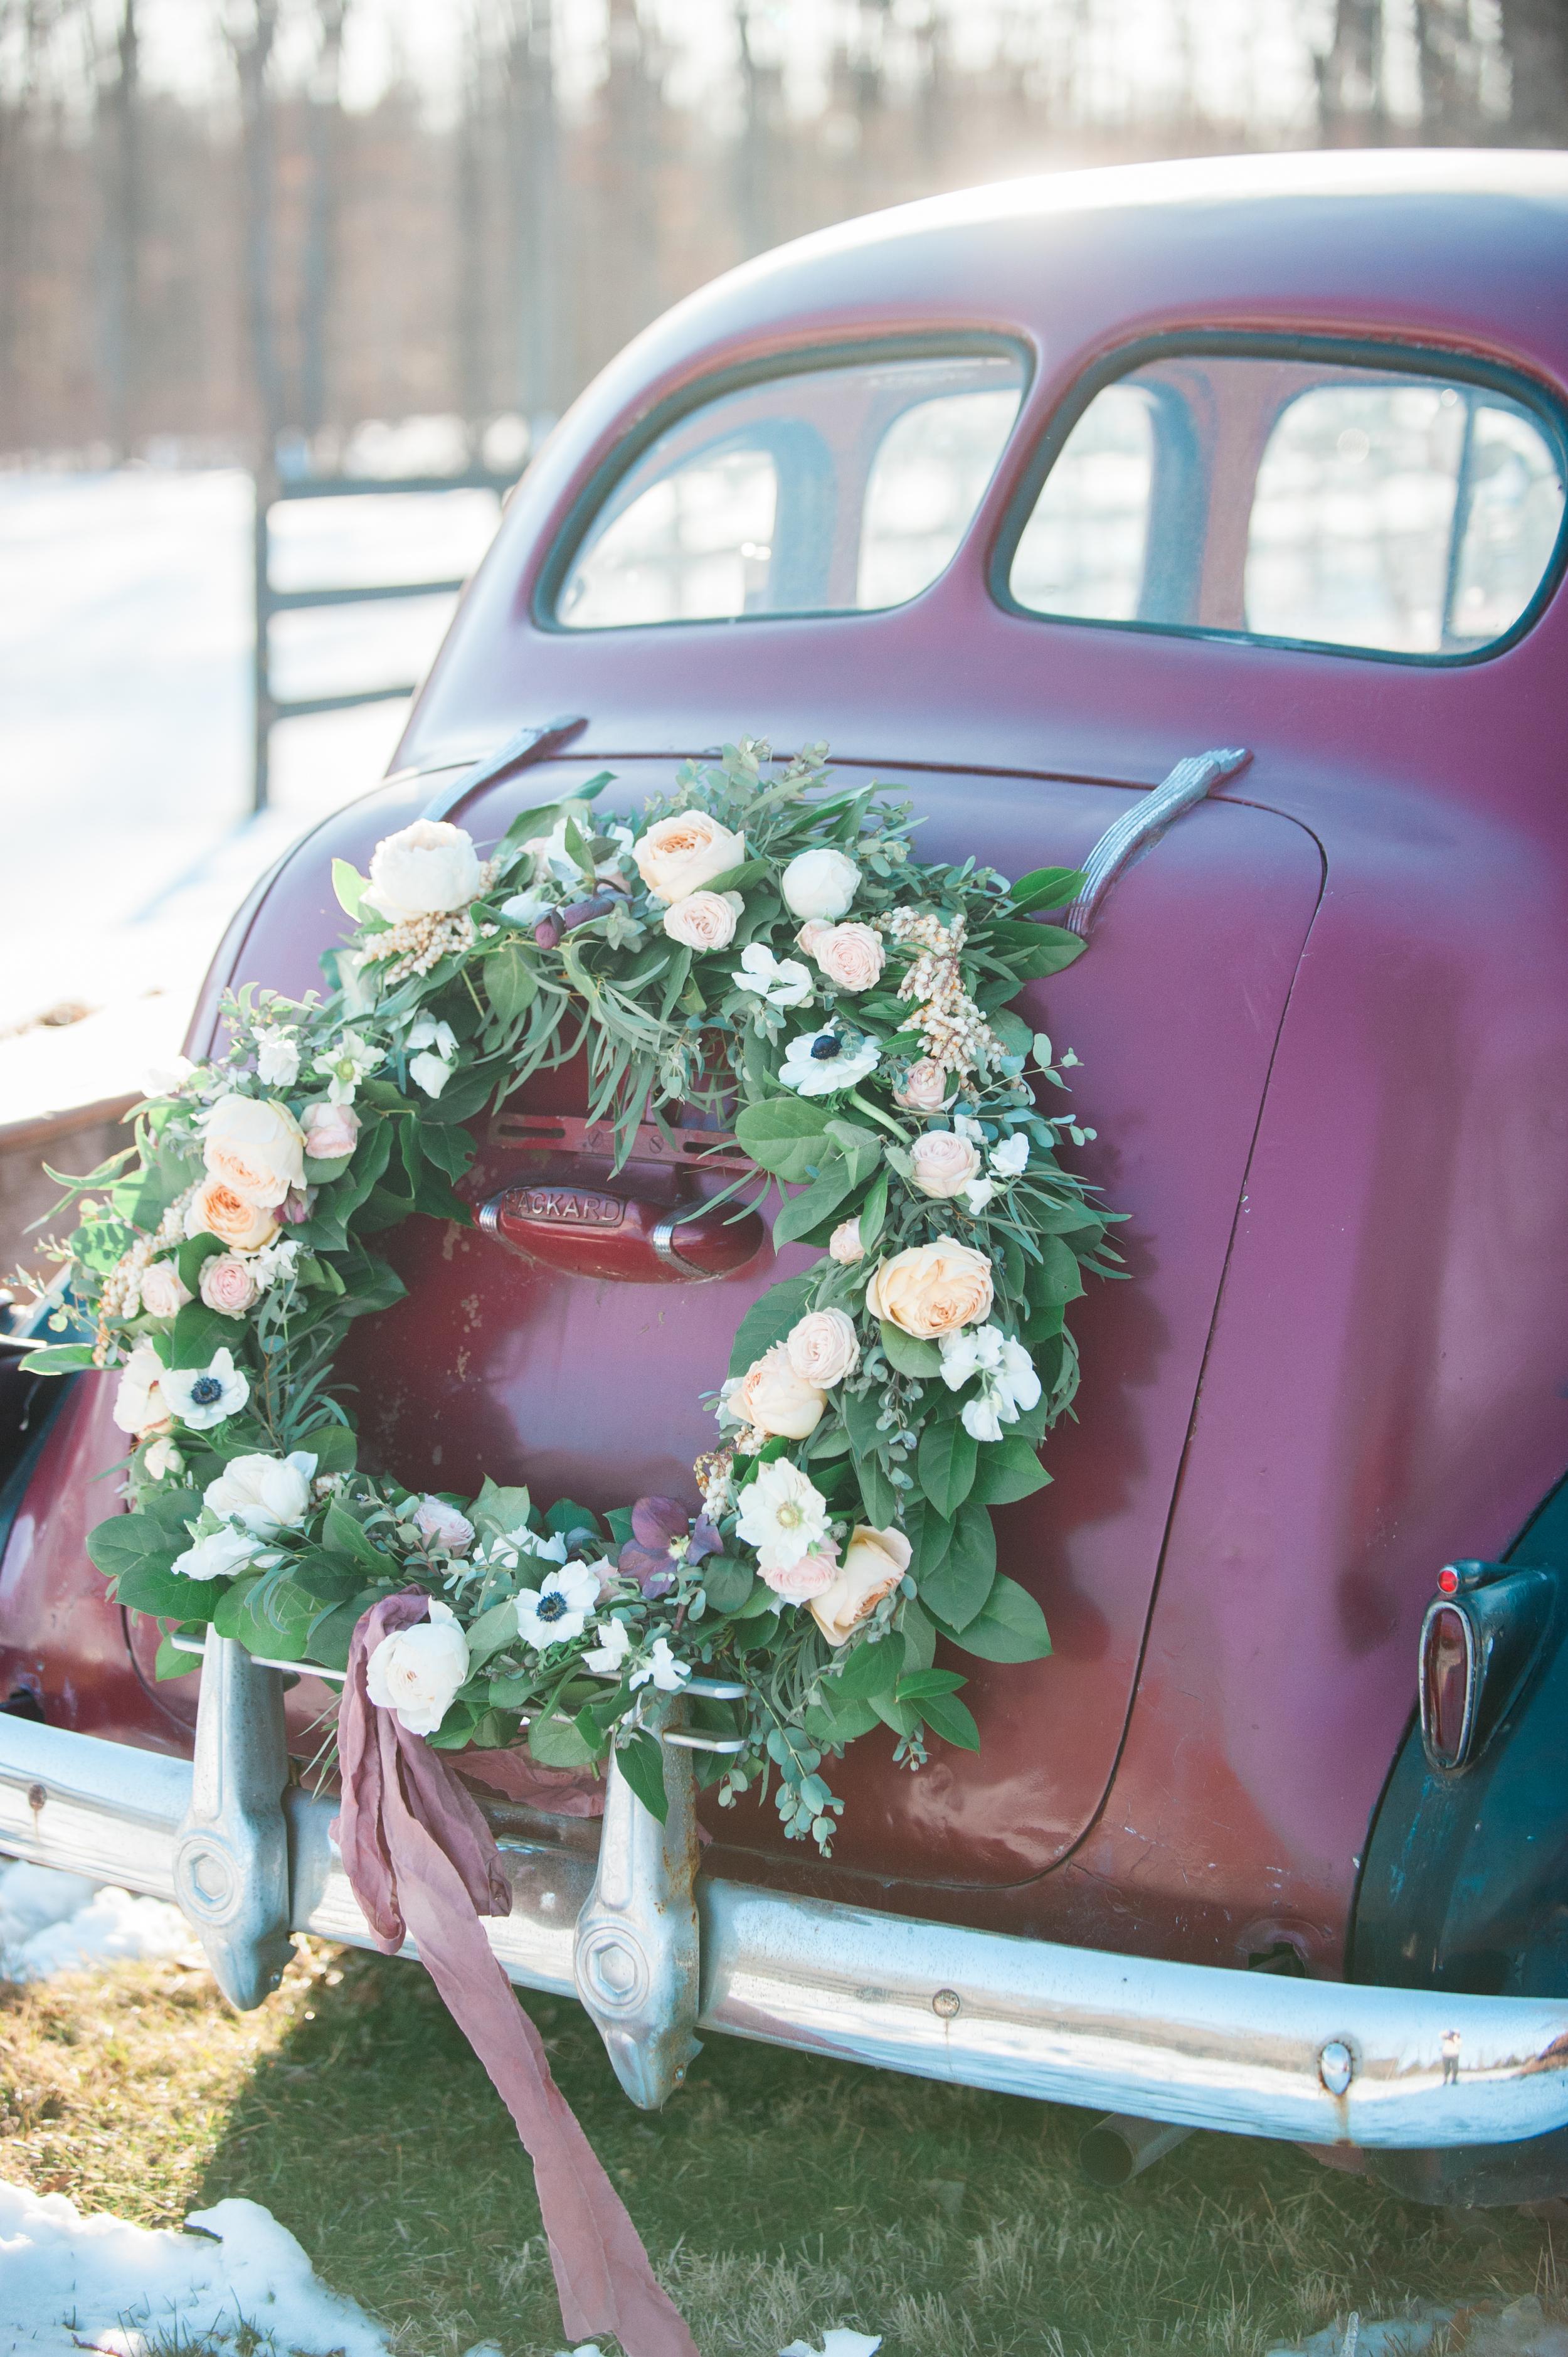 Wild Green Yonder | Car Wreath